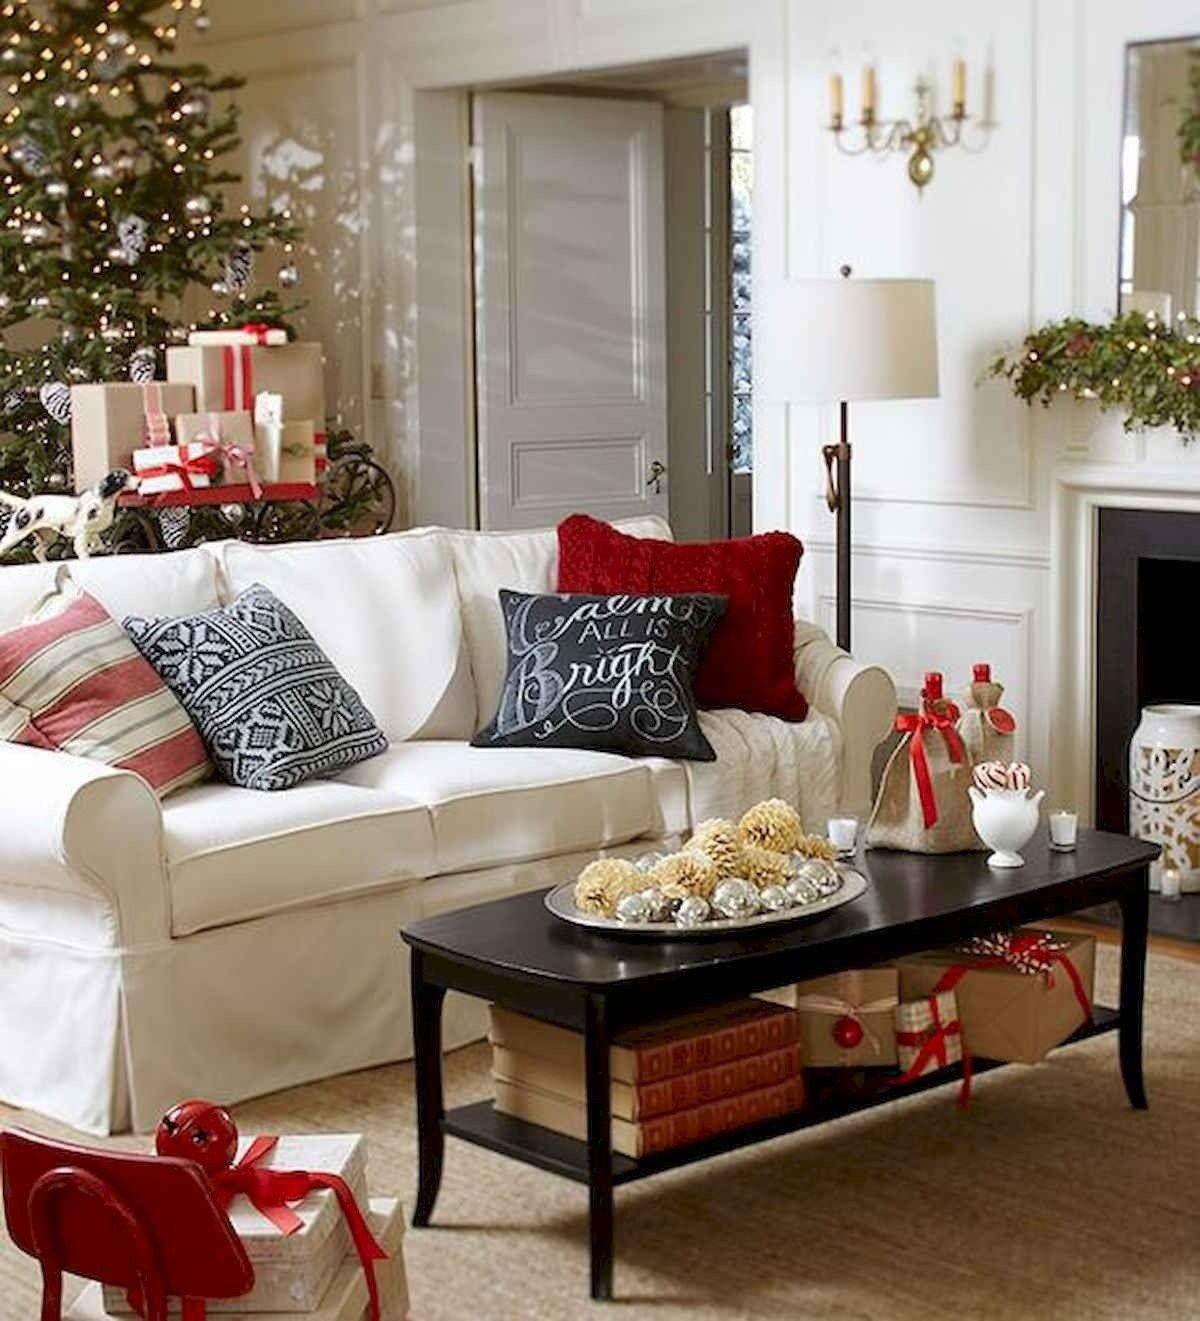 60 Simple Living Room Christmas Decor Ideas 40 Christmas Decorations Living Room Christmas Living Rooms Christmas Decorations For The Home Elegant christmas living room